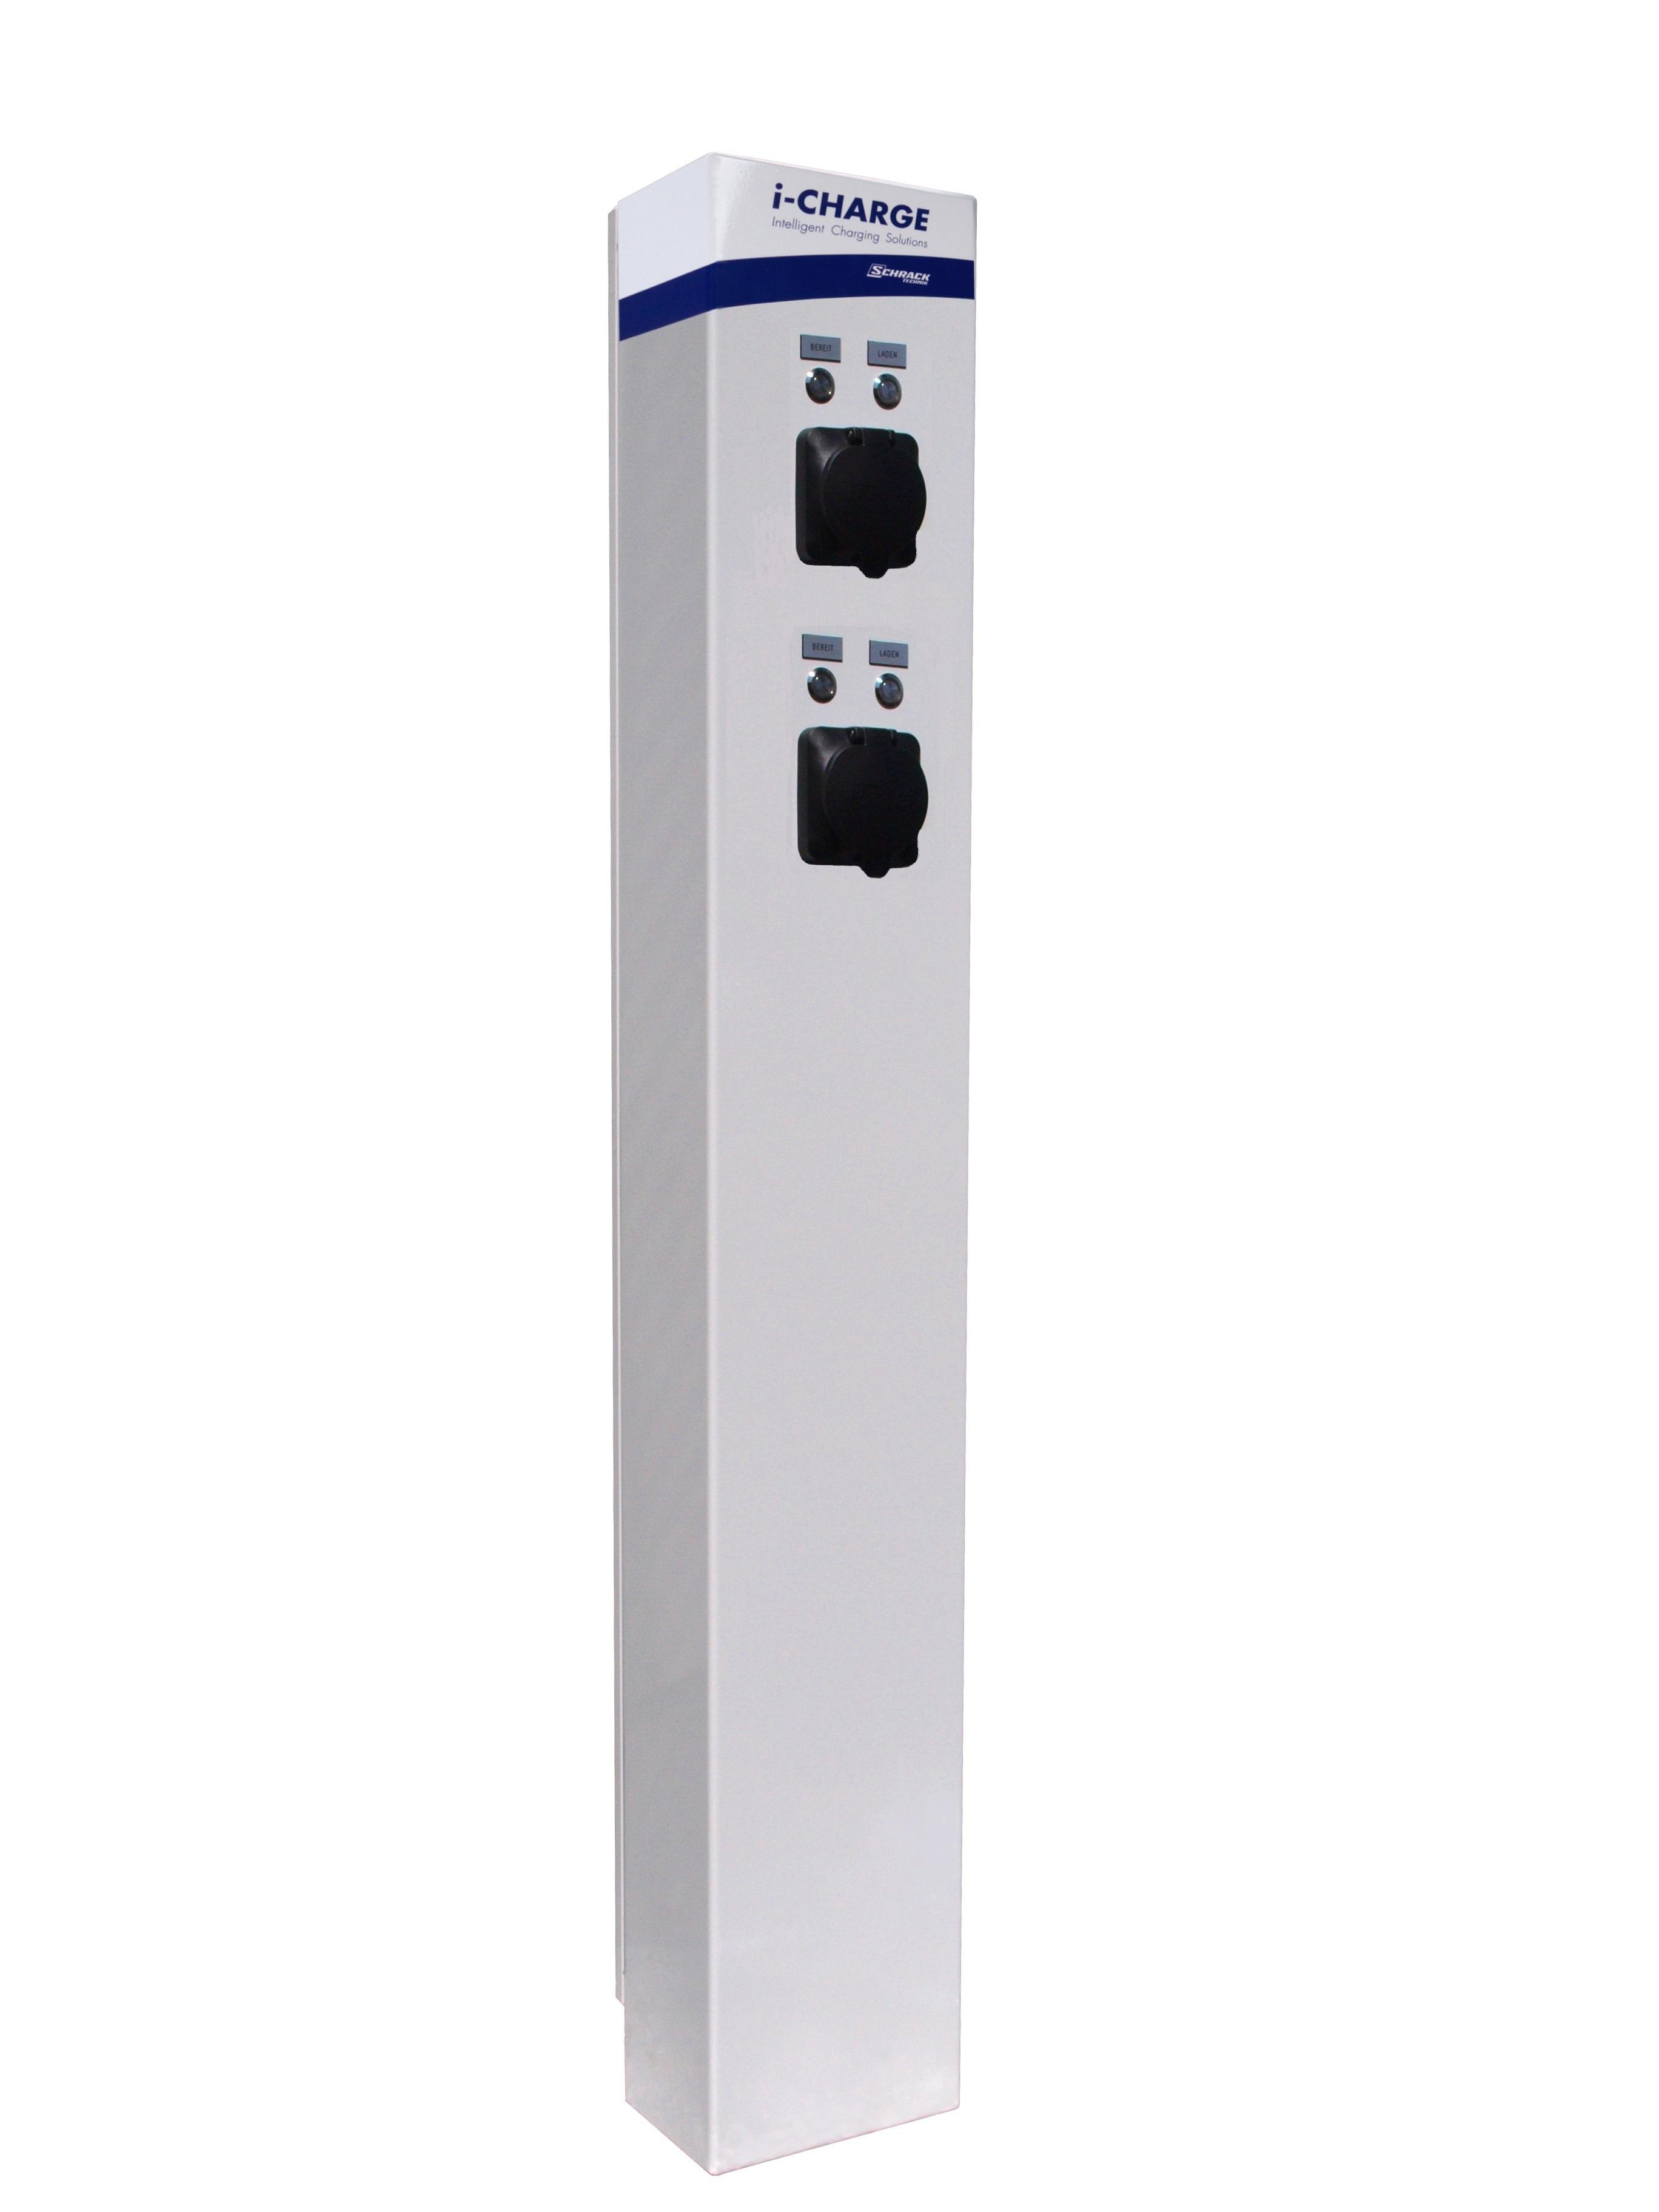 1 Stk i-CHARGE PUBLIC 200 2xTyp2 11kW, Edelstahl mit LS, FI EMPUB027--